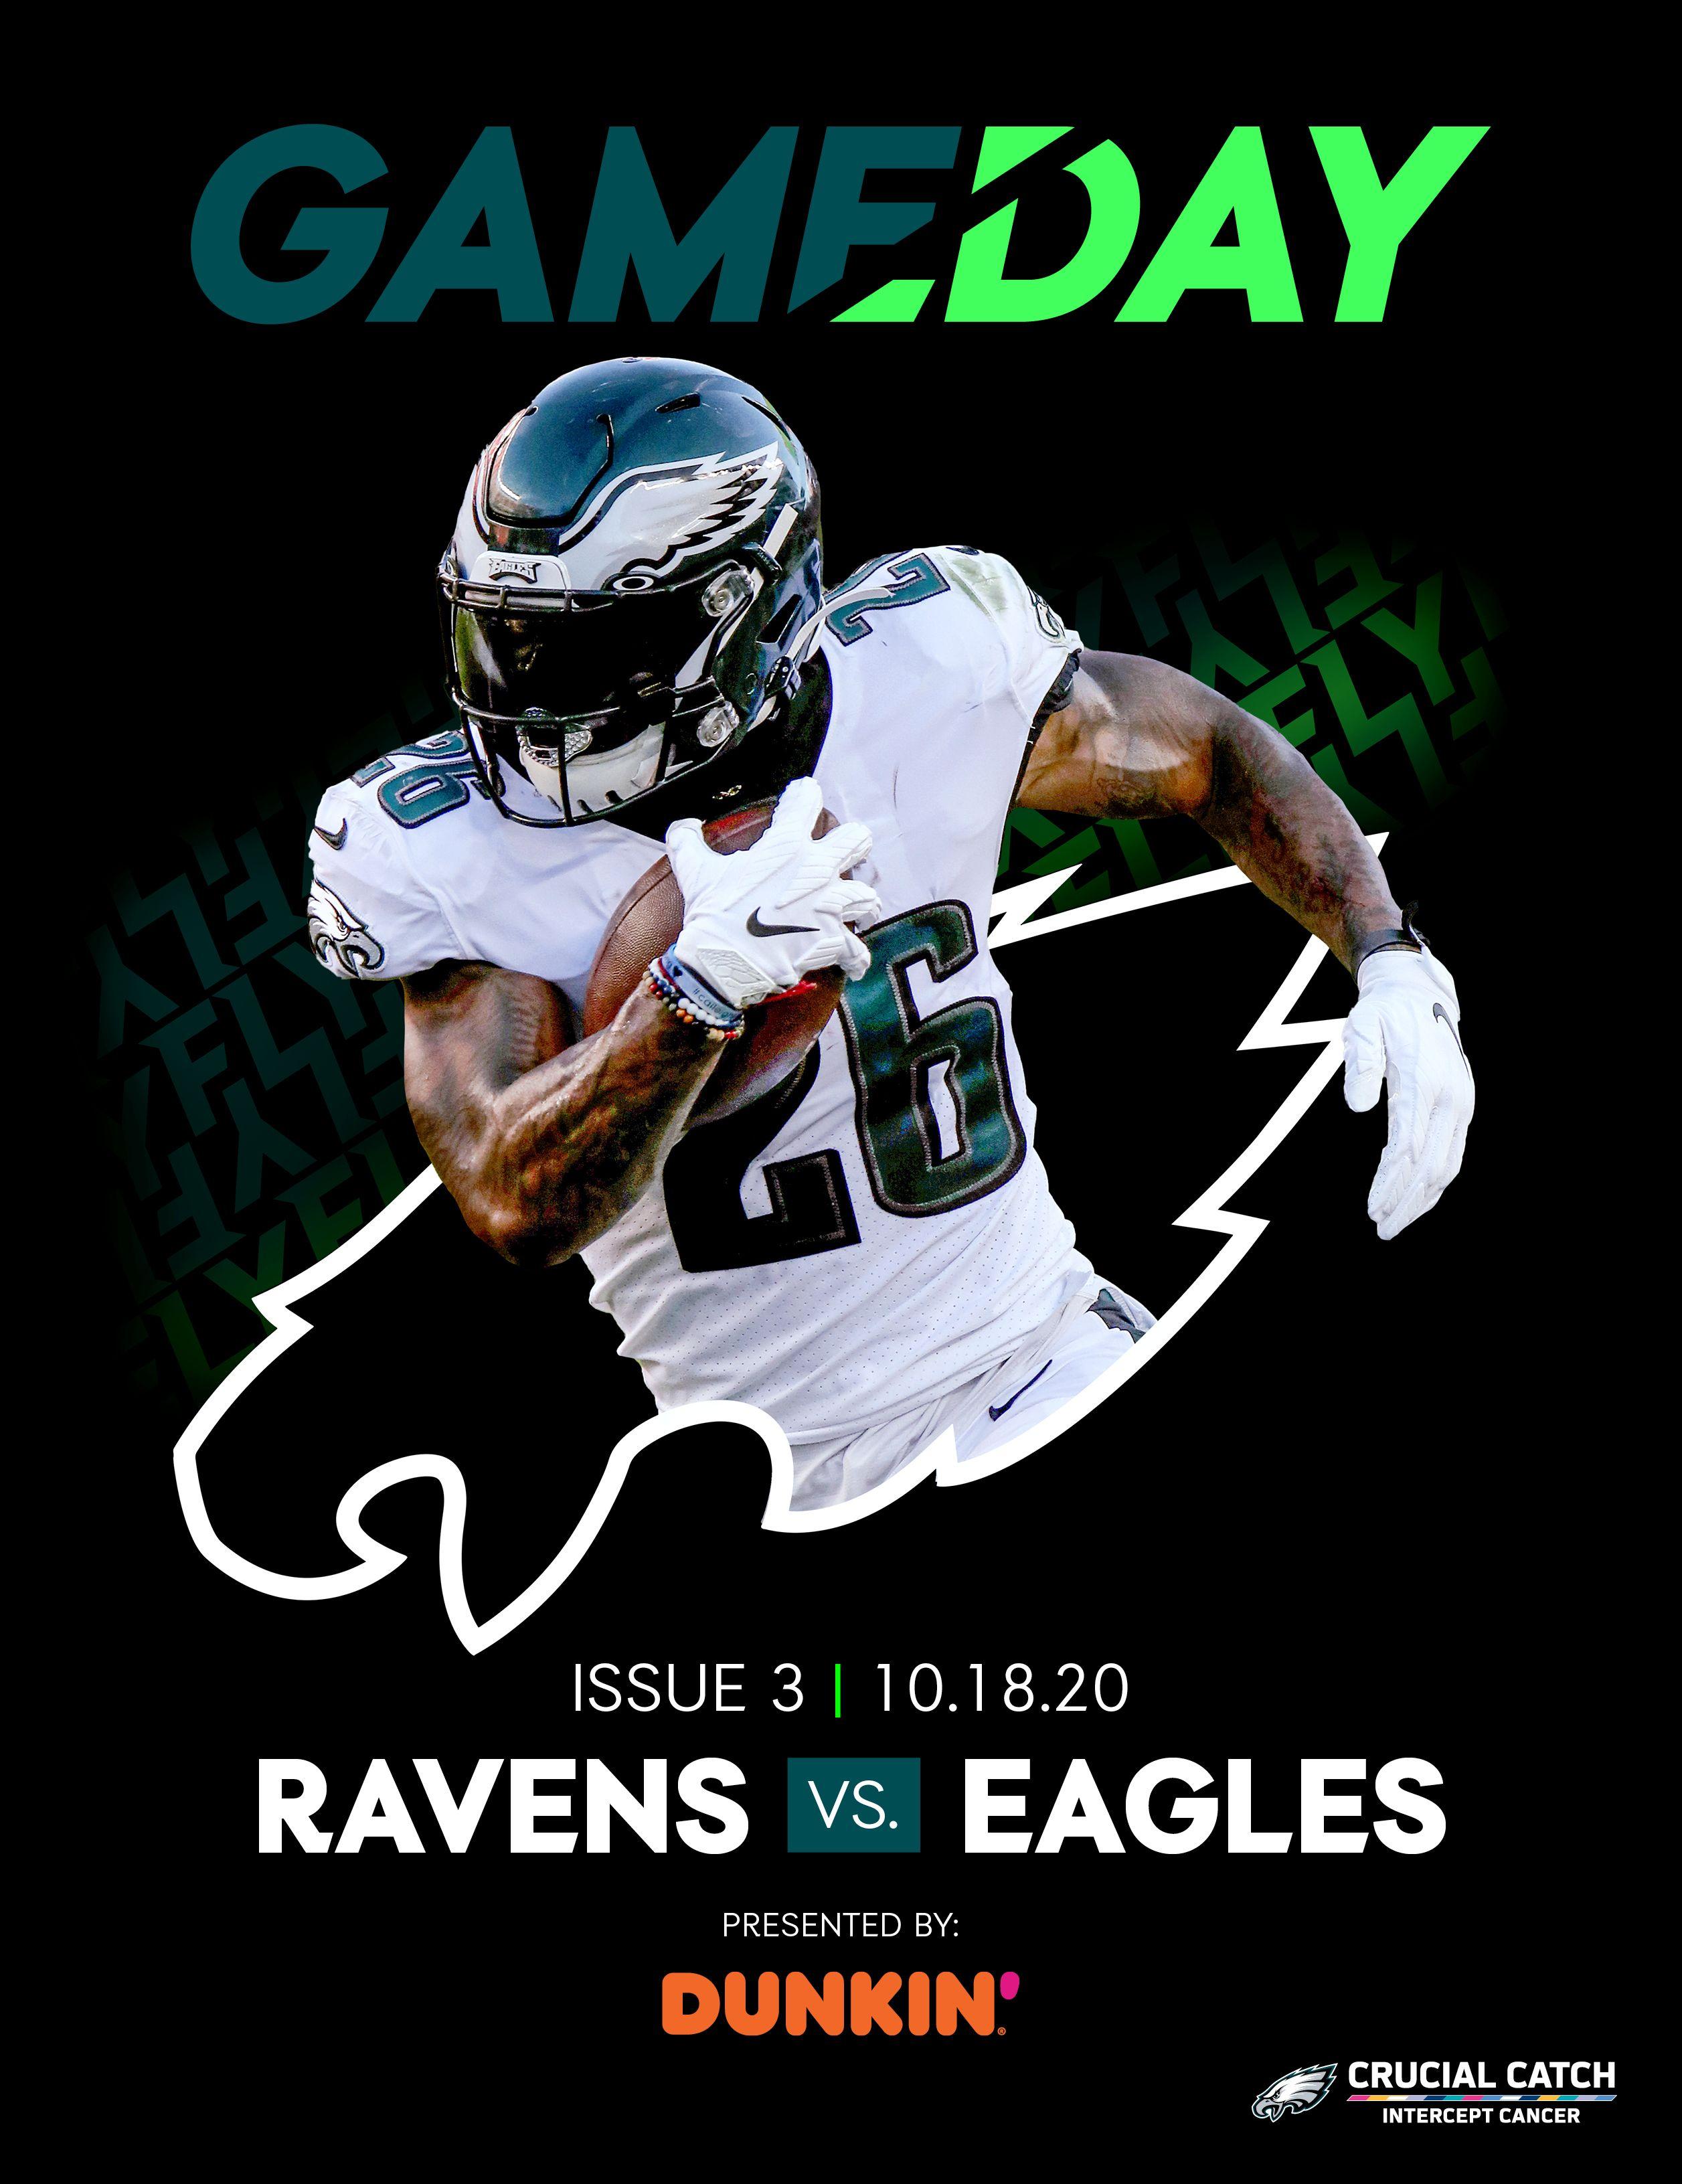 Ravens vs. Eagles